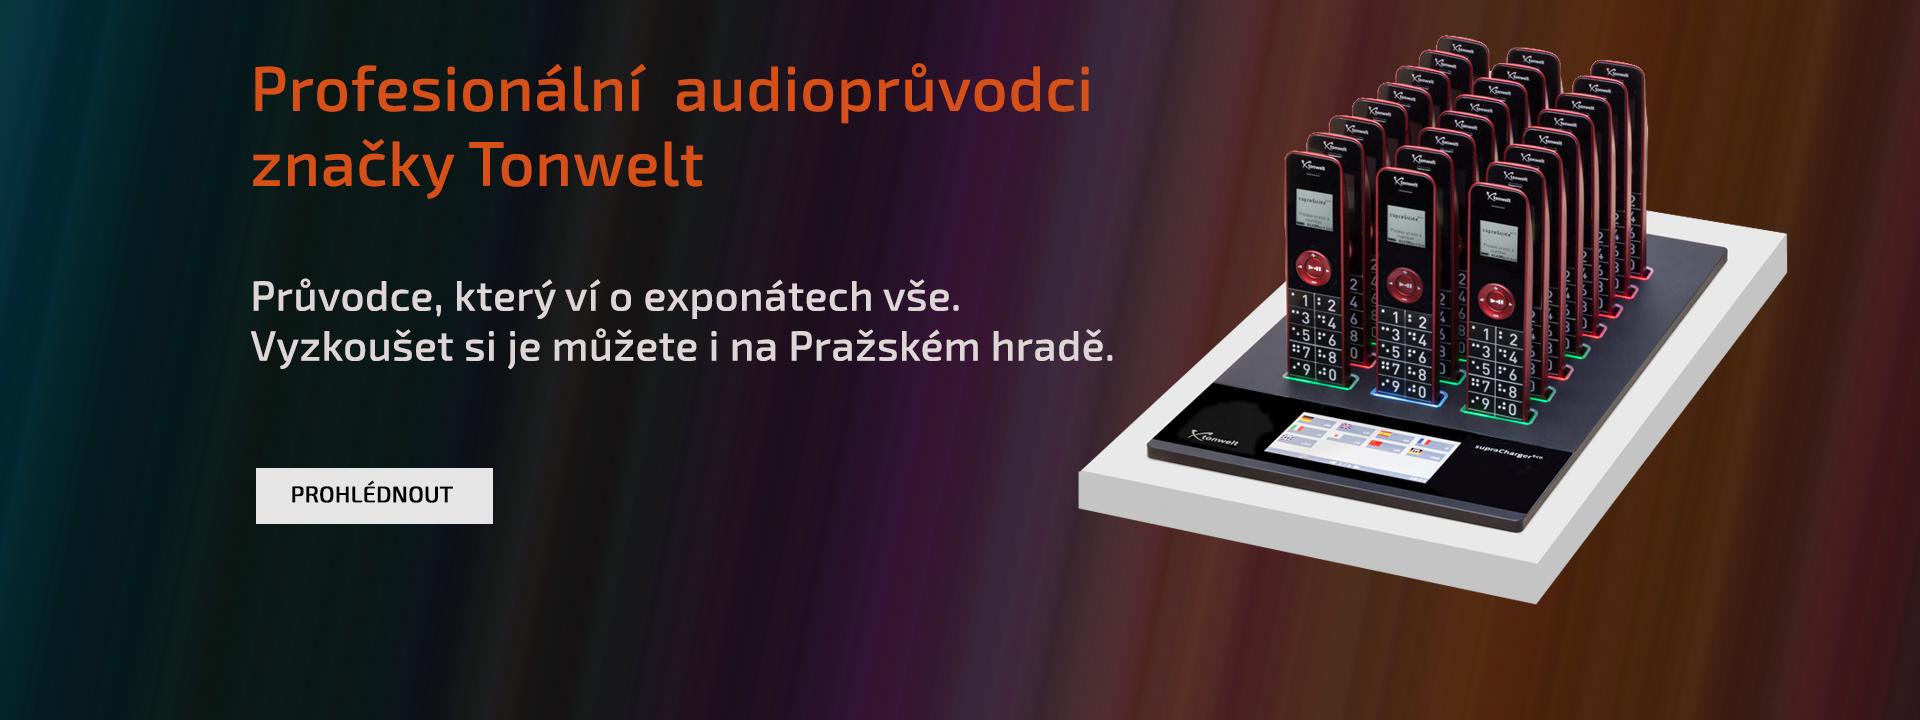 Audioprůvodci Tonwelt